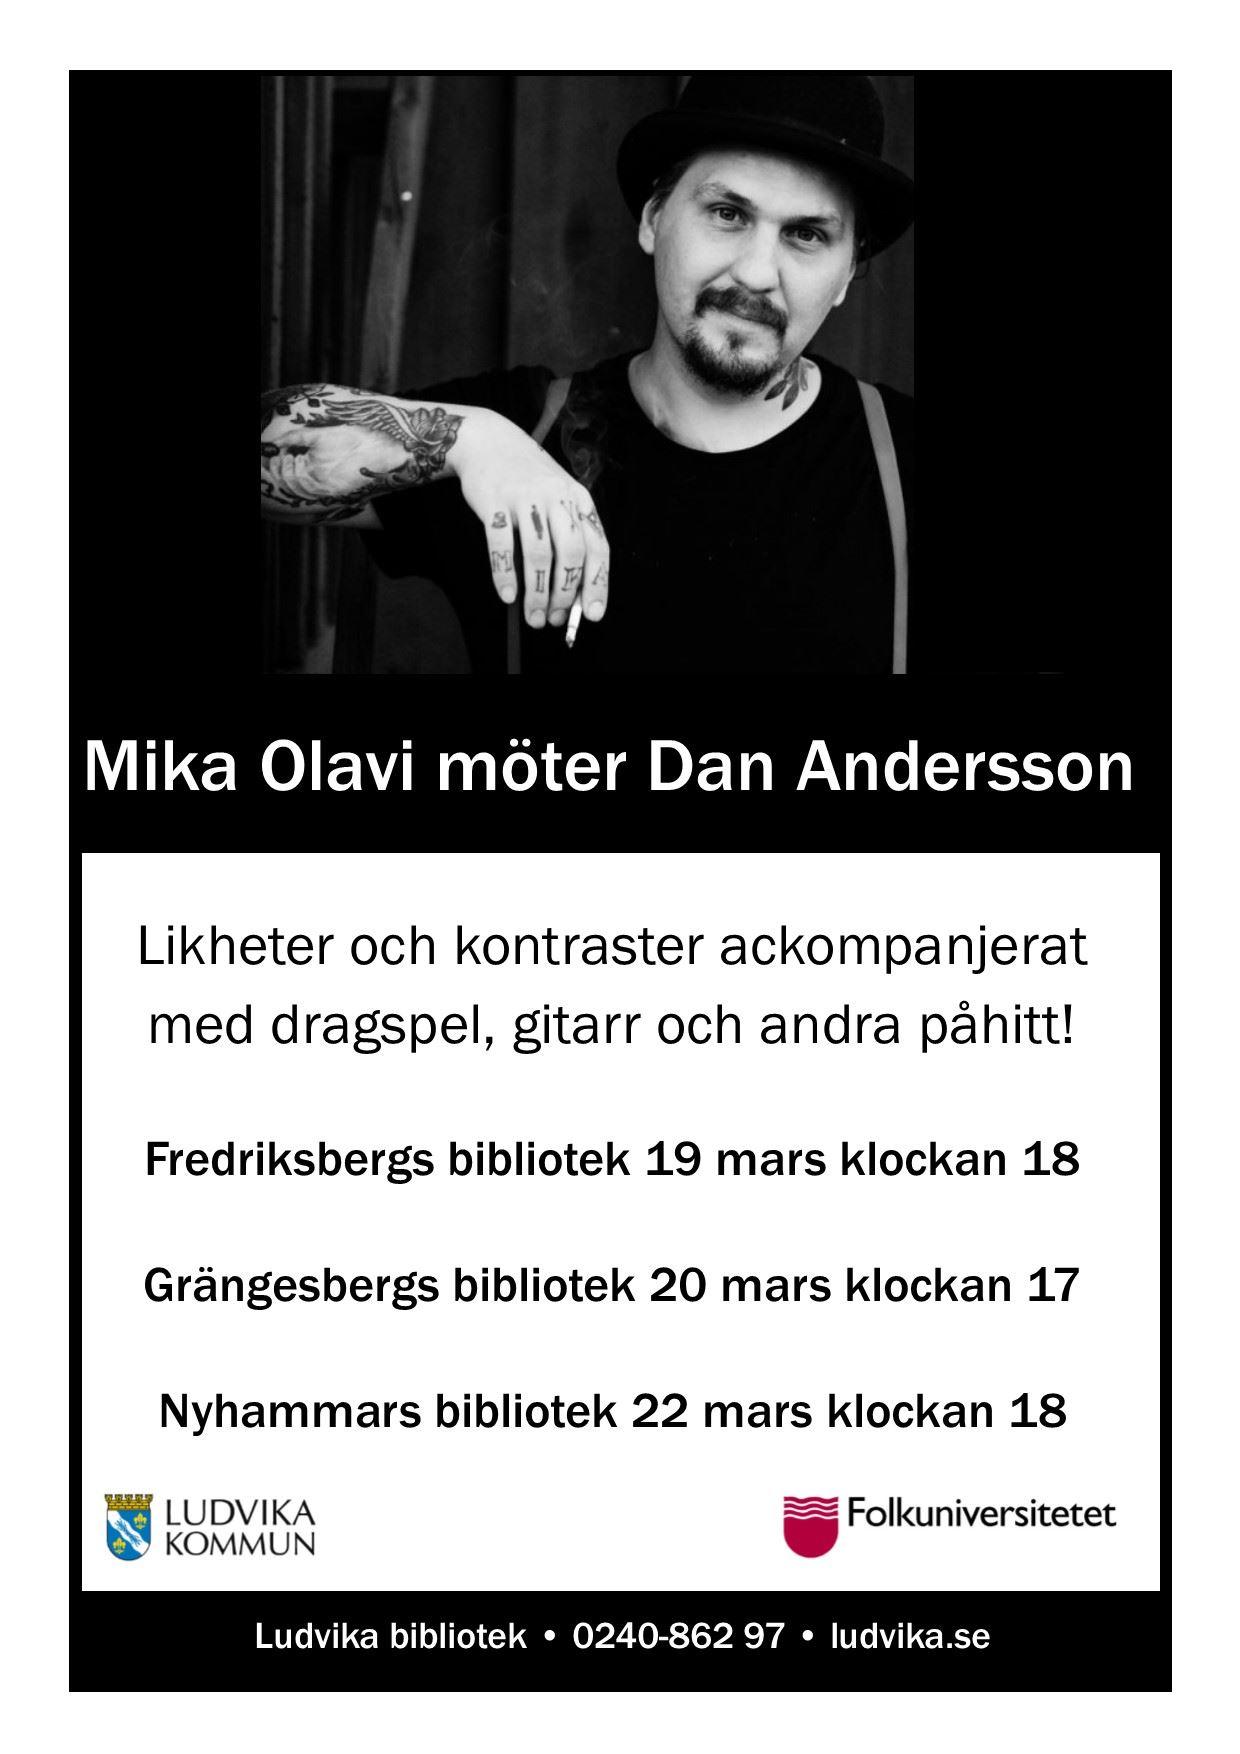 Mika Olavi möter Dan Andersson